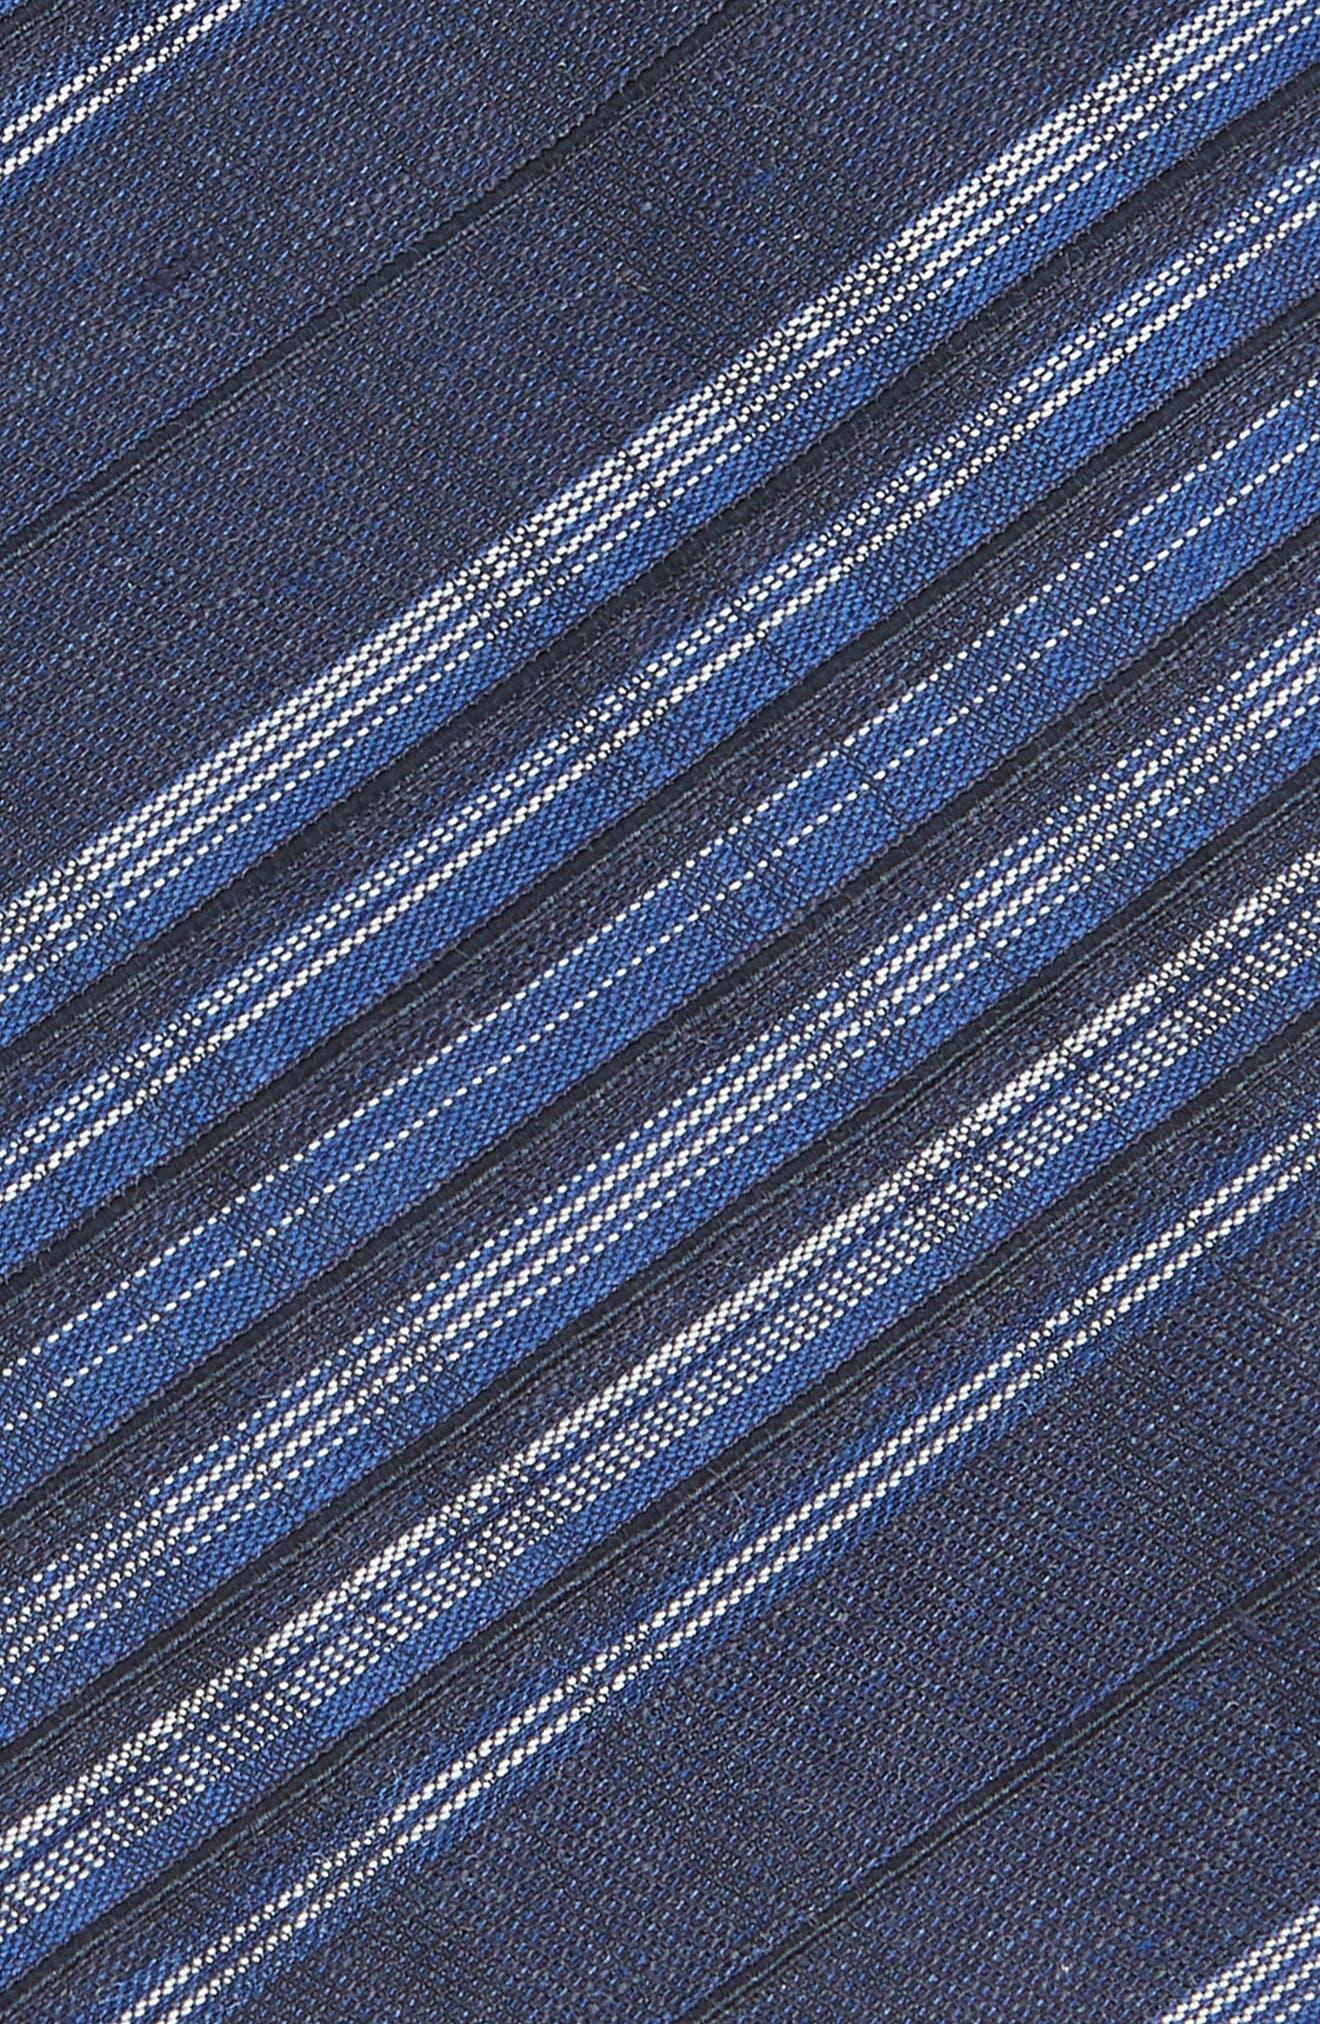 Plaid Silk Tie,                             Alternate thumbnail 2, color,                             404